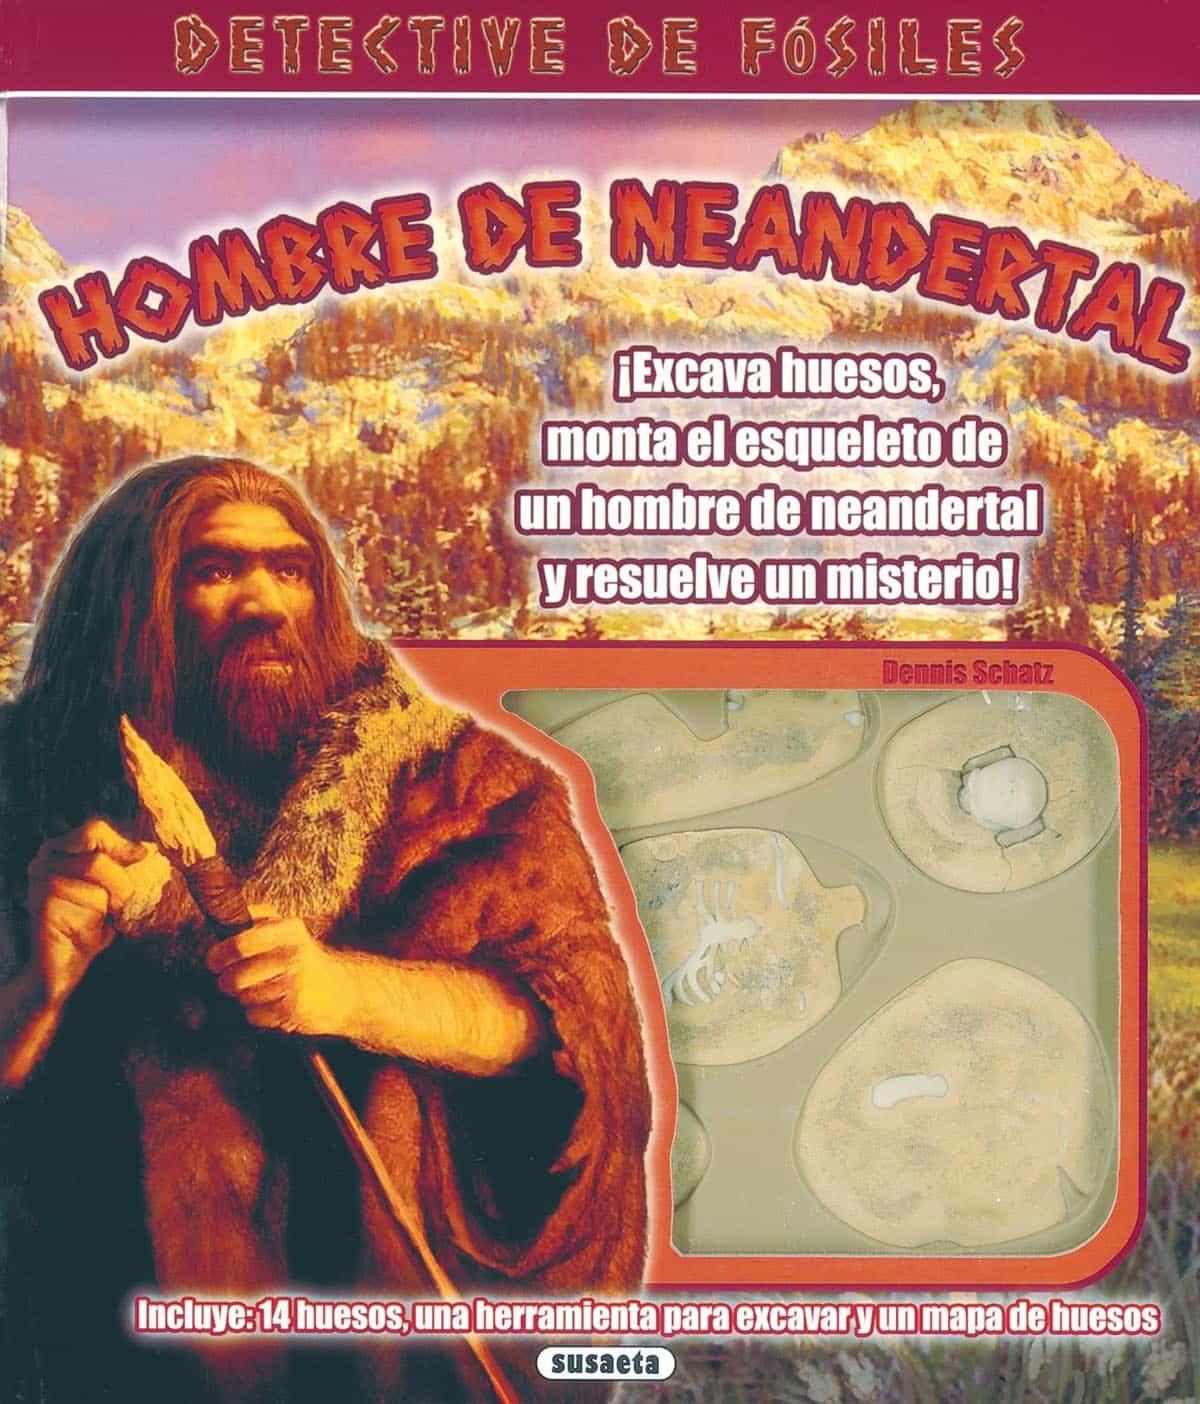 Hombre De Neandertal: Detective De Fosiles - Vv.aa.